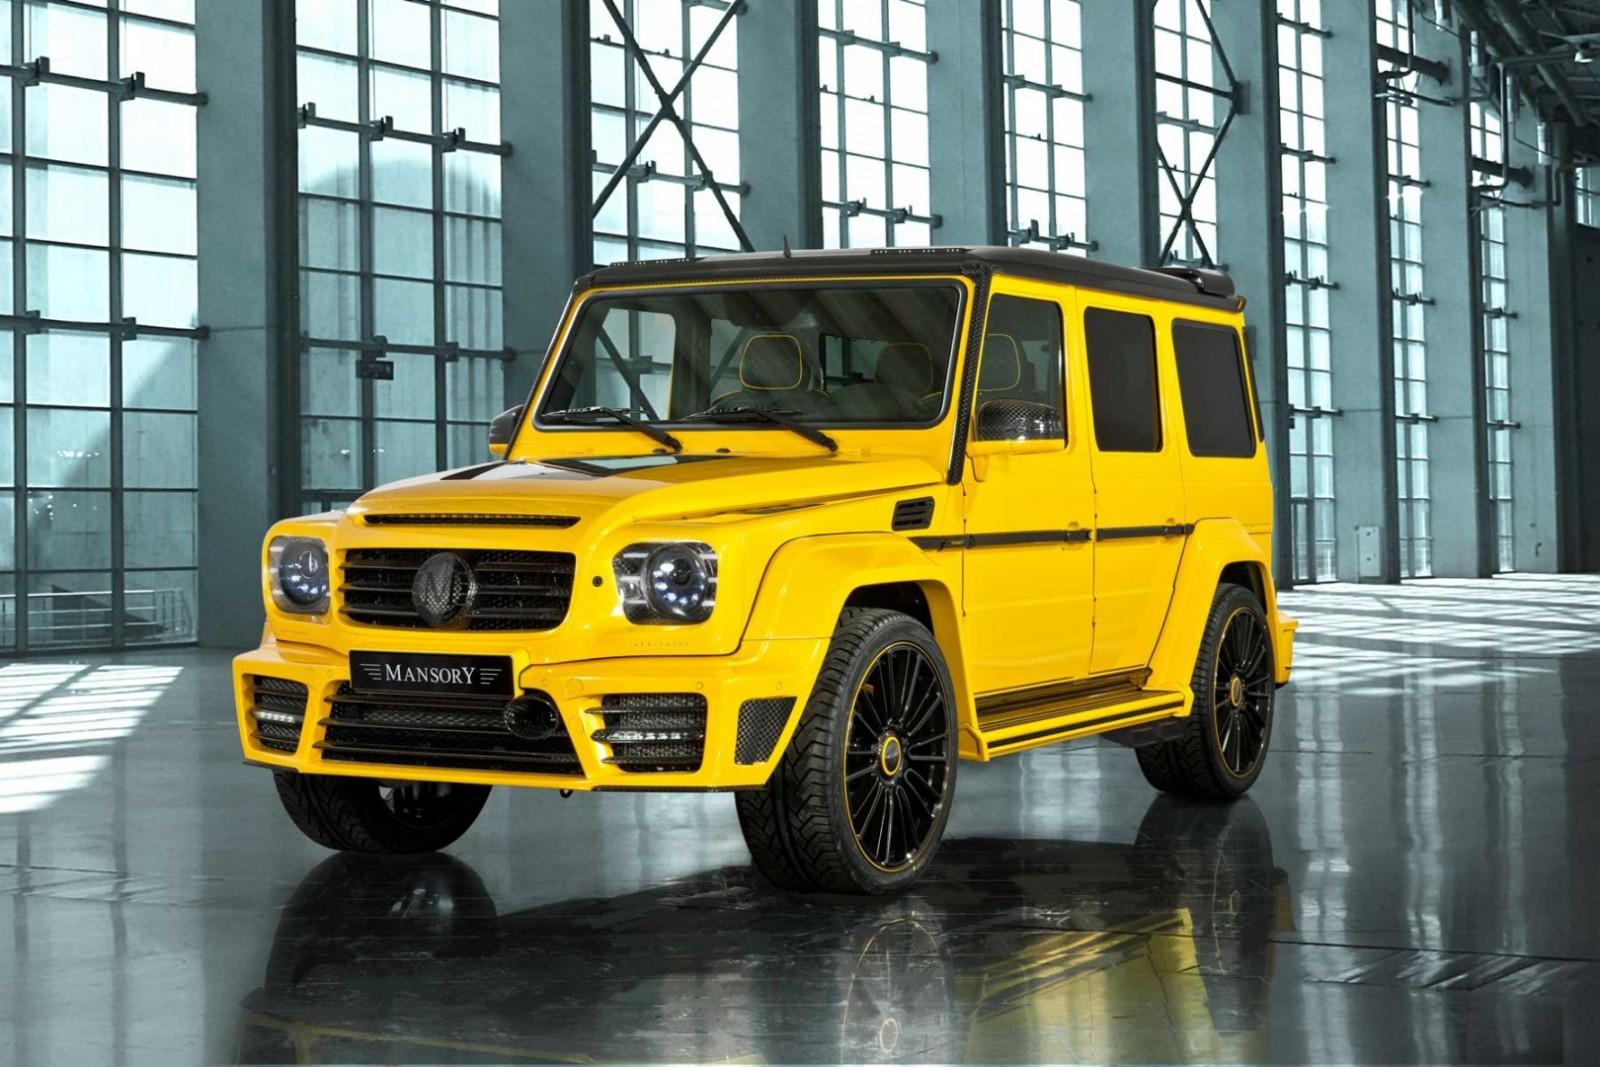 Mansory tuned mercedes benz g63 amg gronos for Mercedes benz truck g class